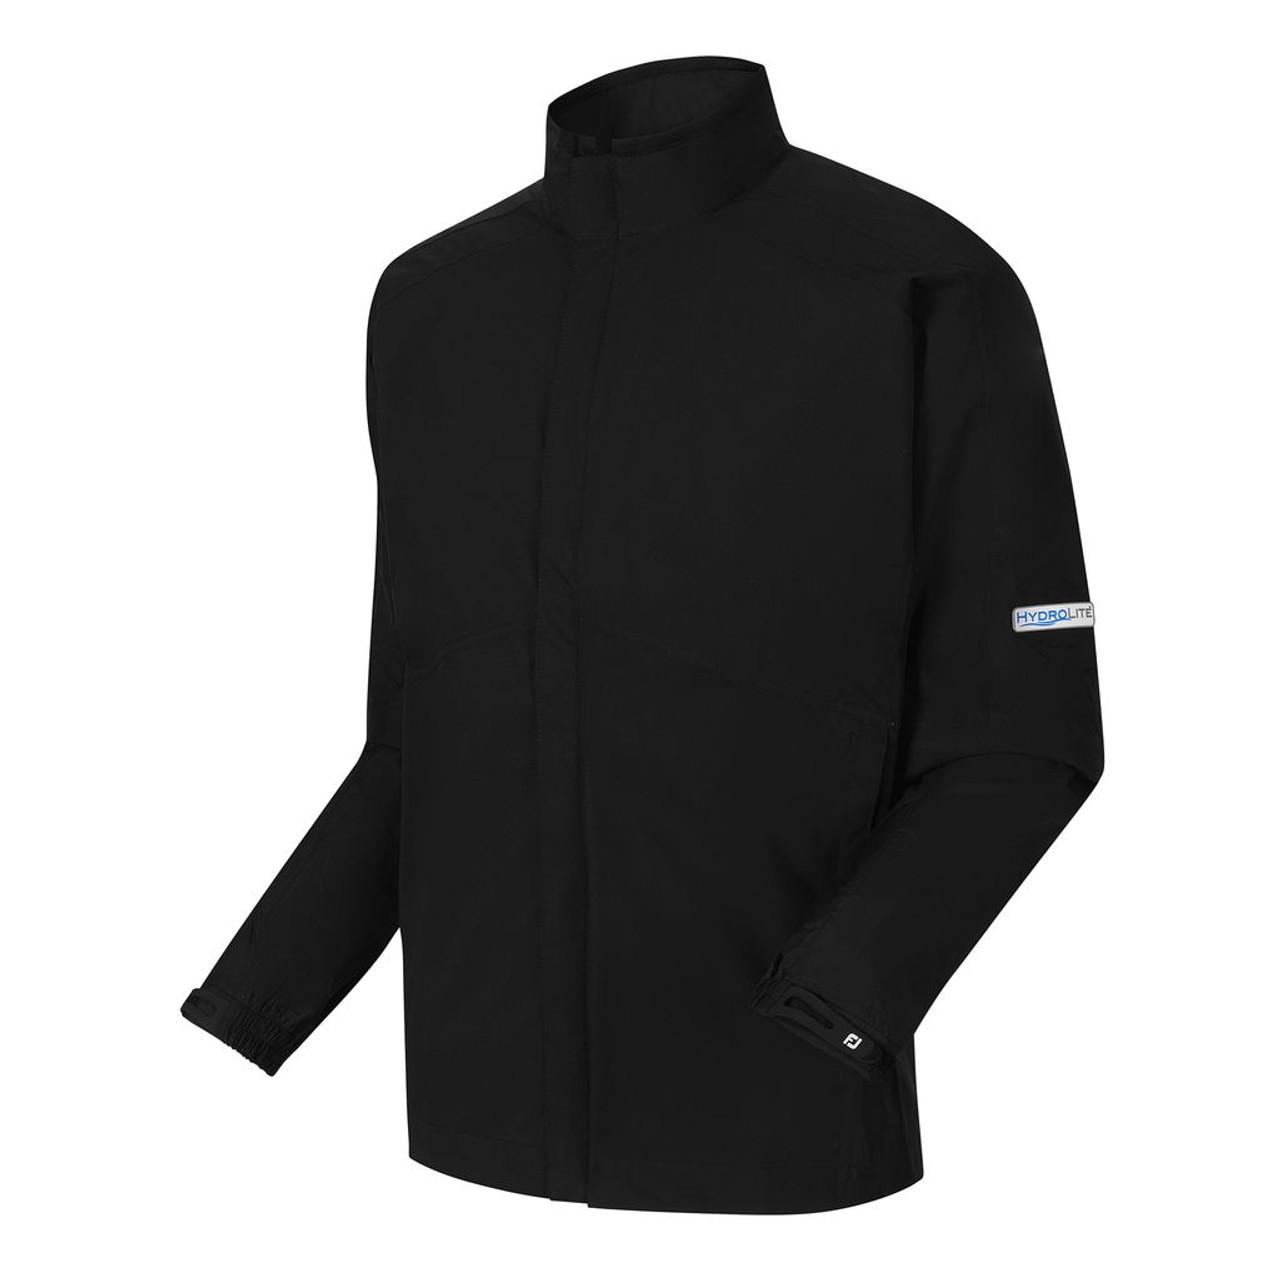 d304b1cb281c FJ HydroLite Rain Jacket Zip-Off Sleeves (Black) - Fiddler s Green Golf  Center